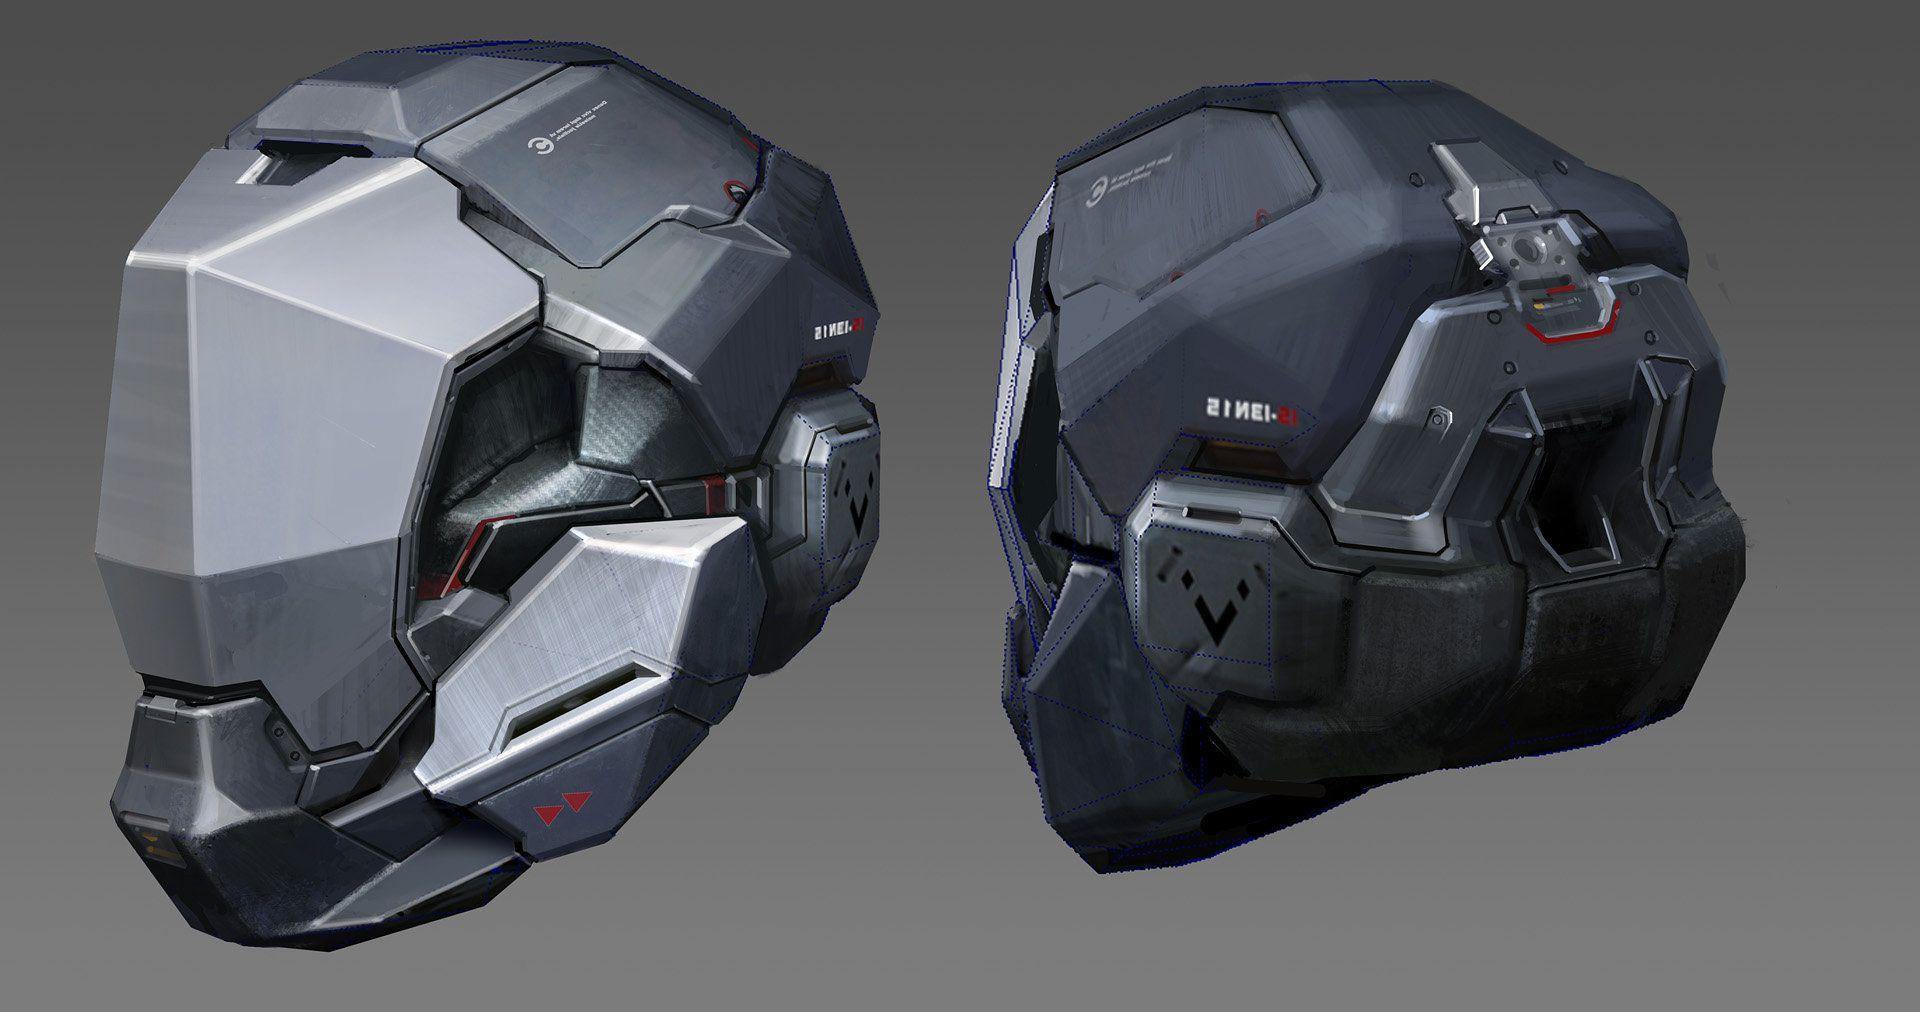 ArtStation - Helmet Concept, William Chen | Objects ...